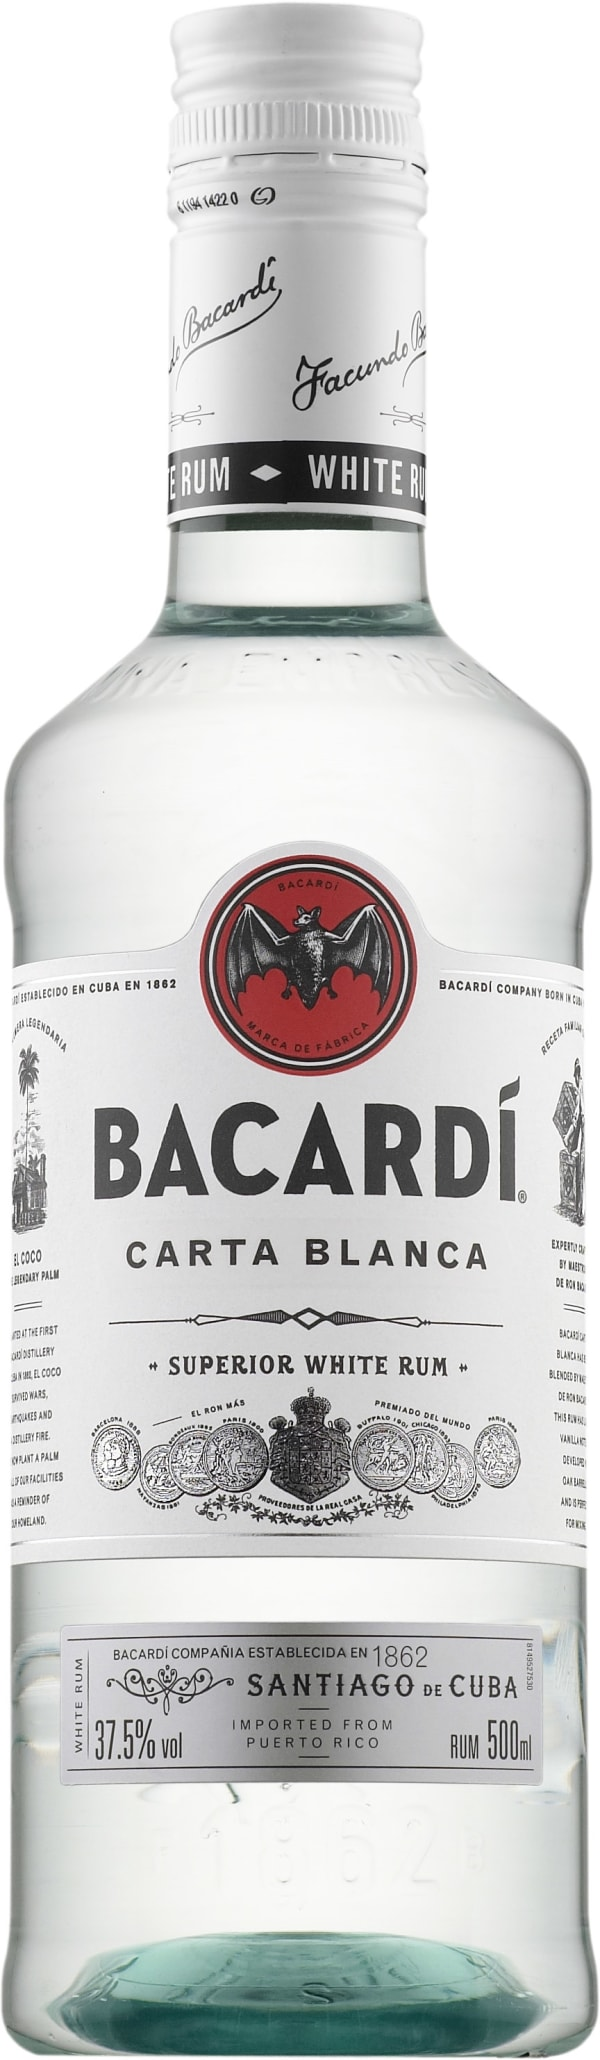 Bacardi Carta Blanca  plastflaska